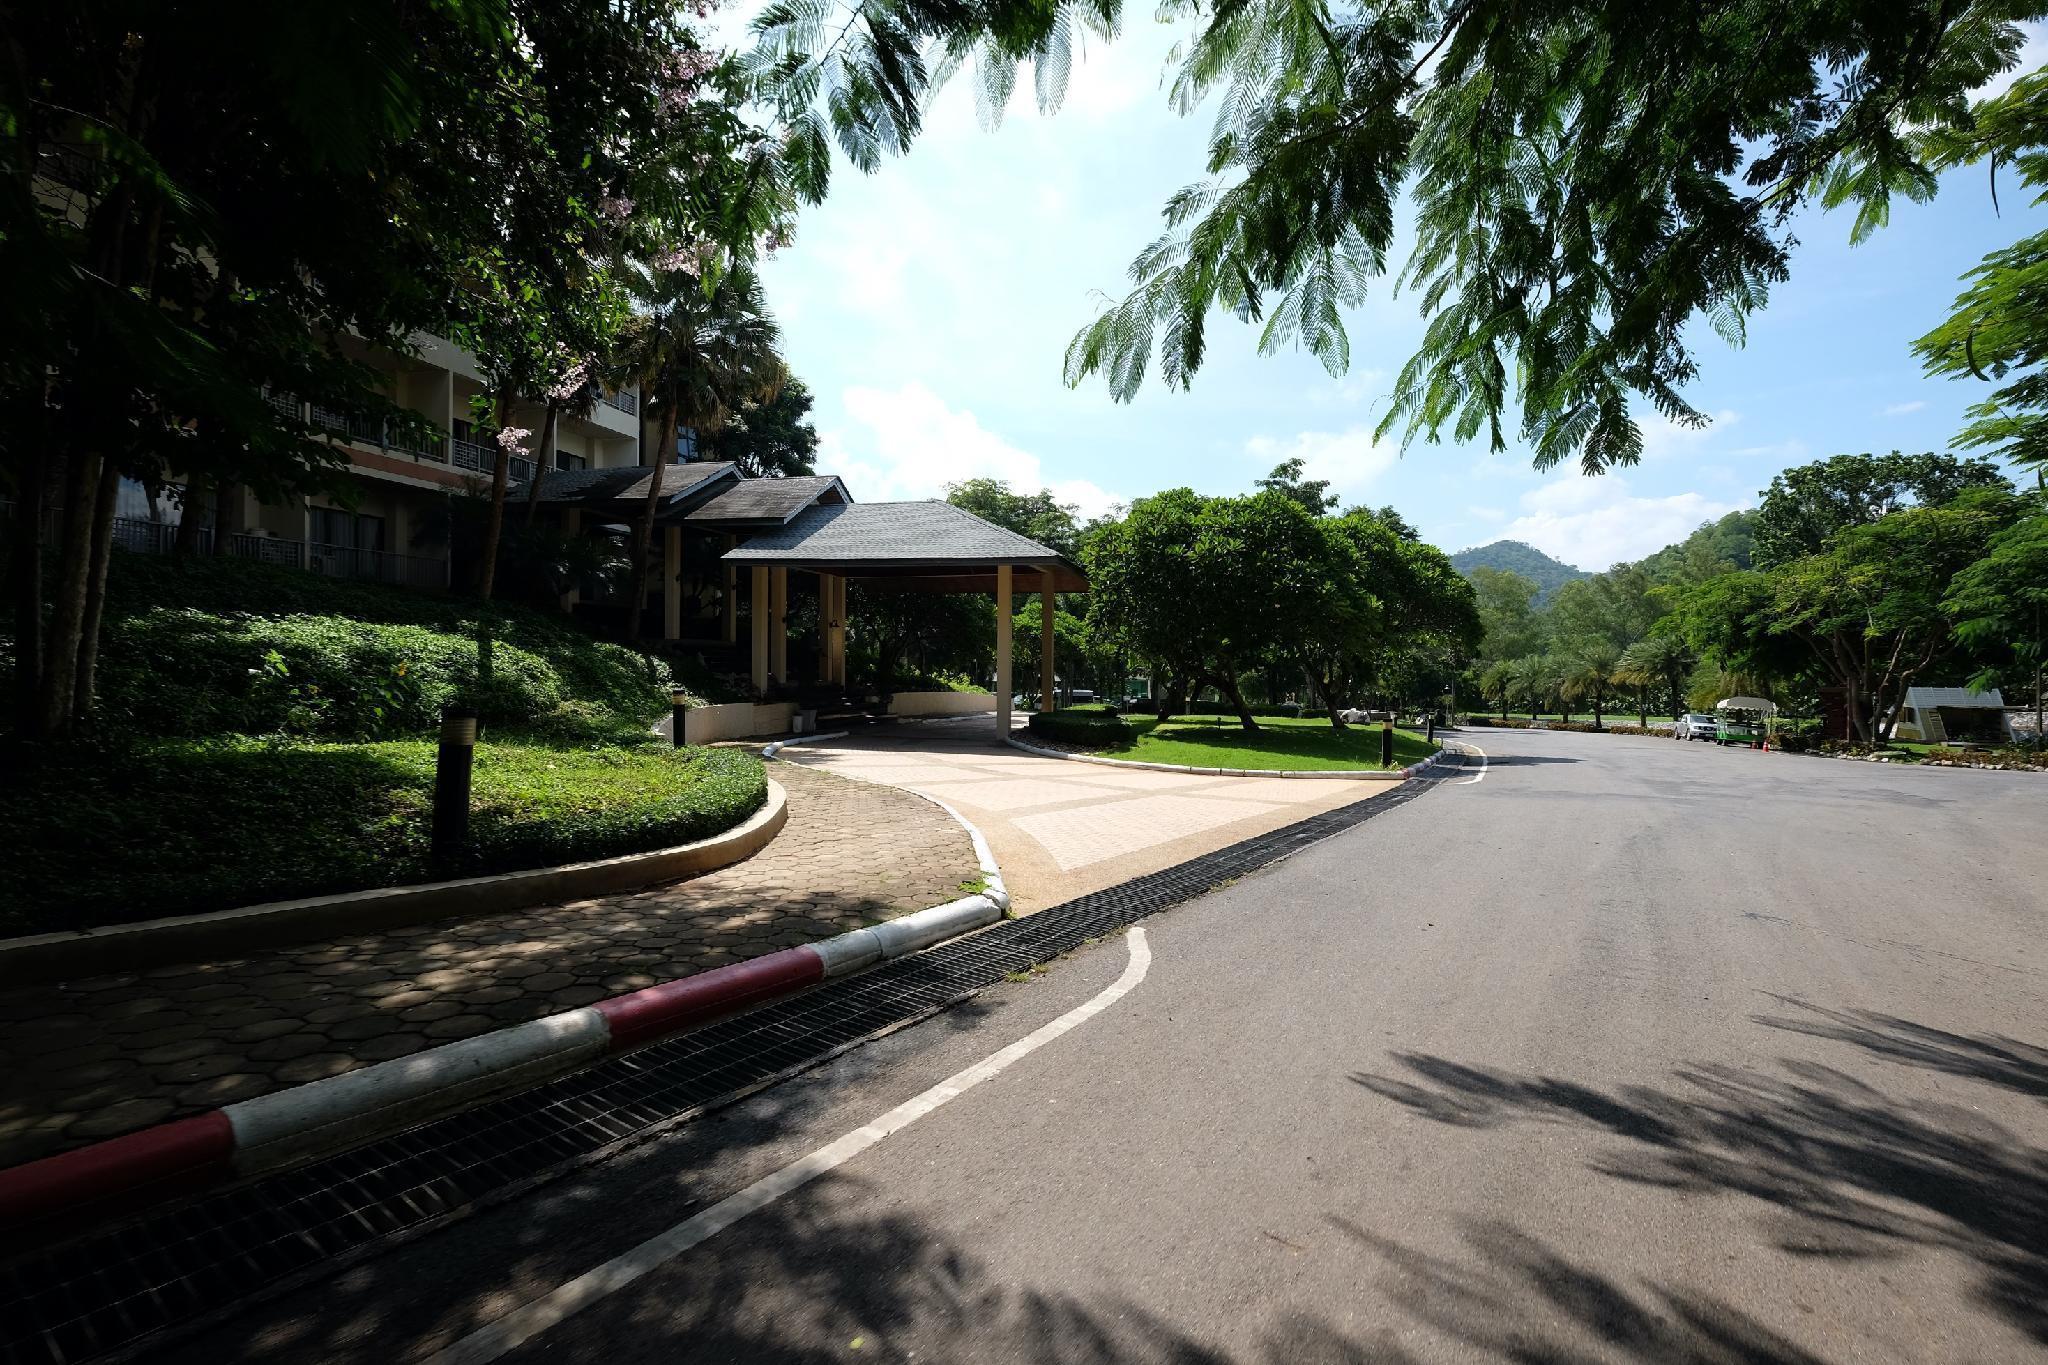 Sak Phu Duen Hotel & Resort